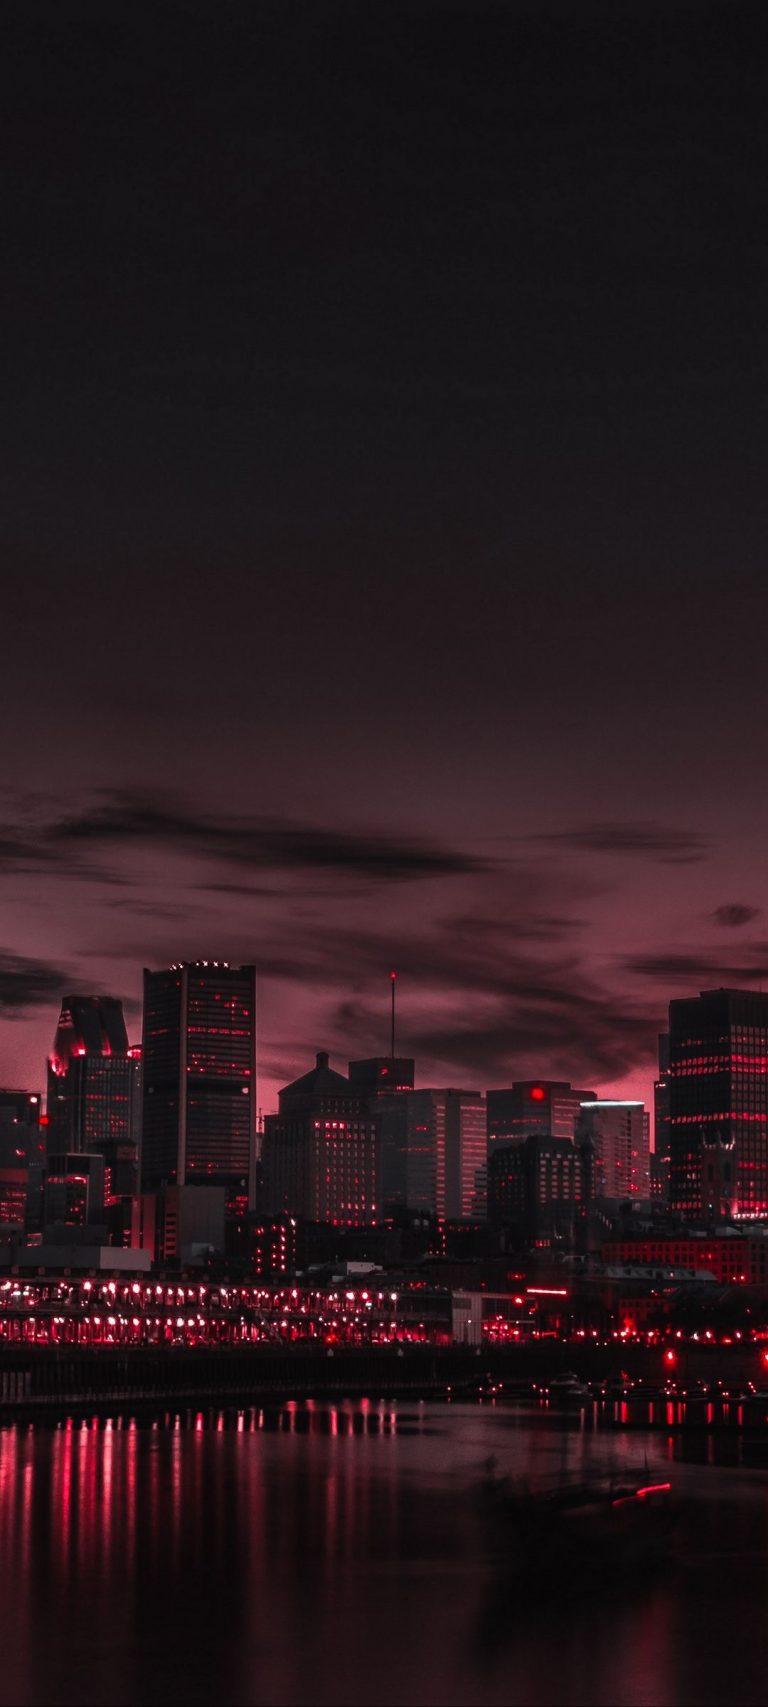 City Night Panorama 1080x2400 768x1707